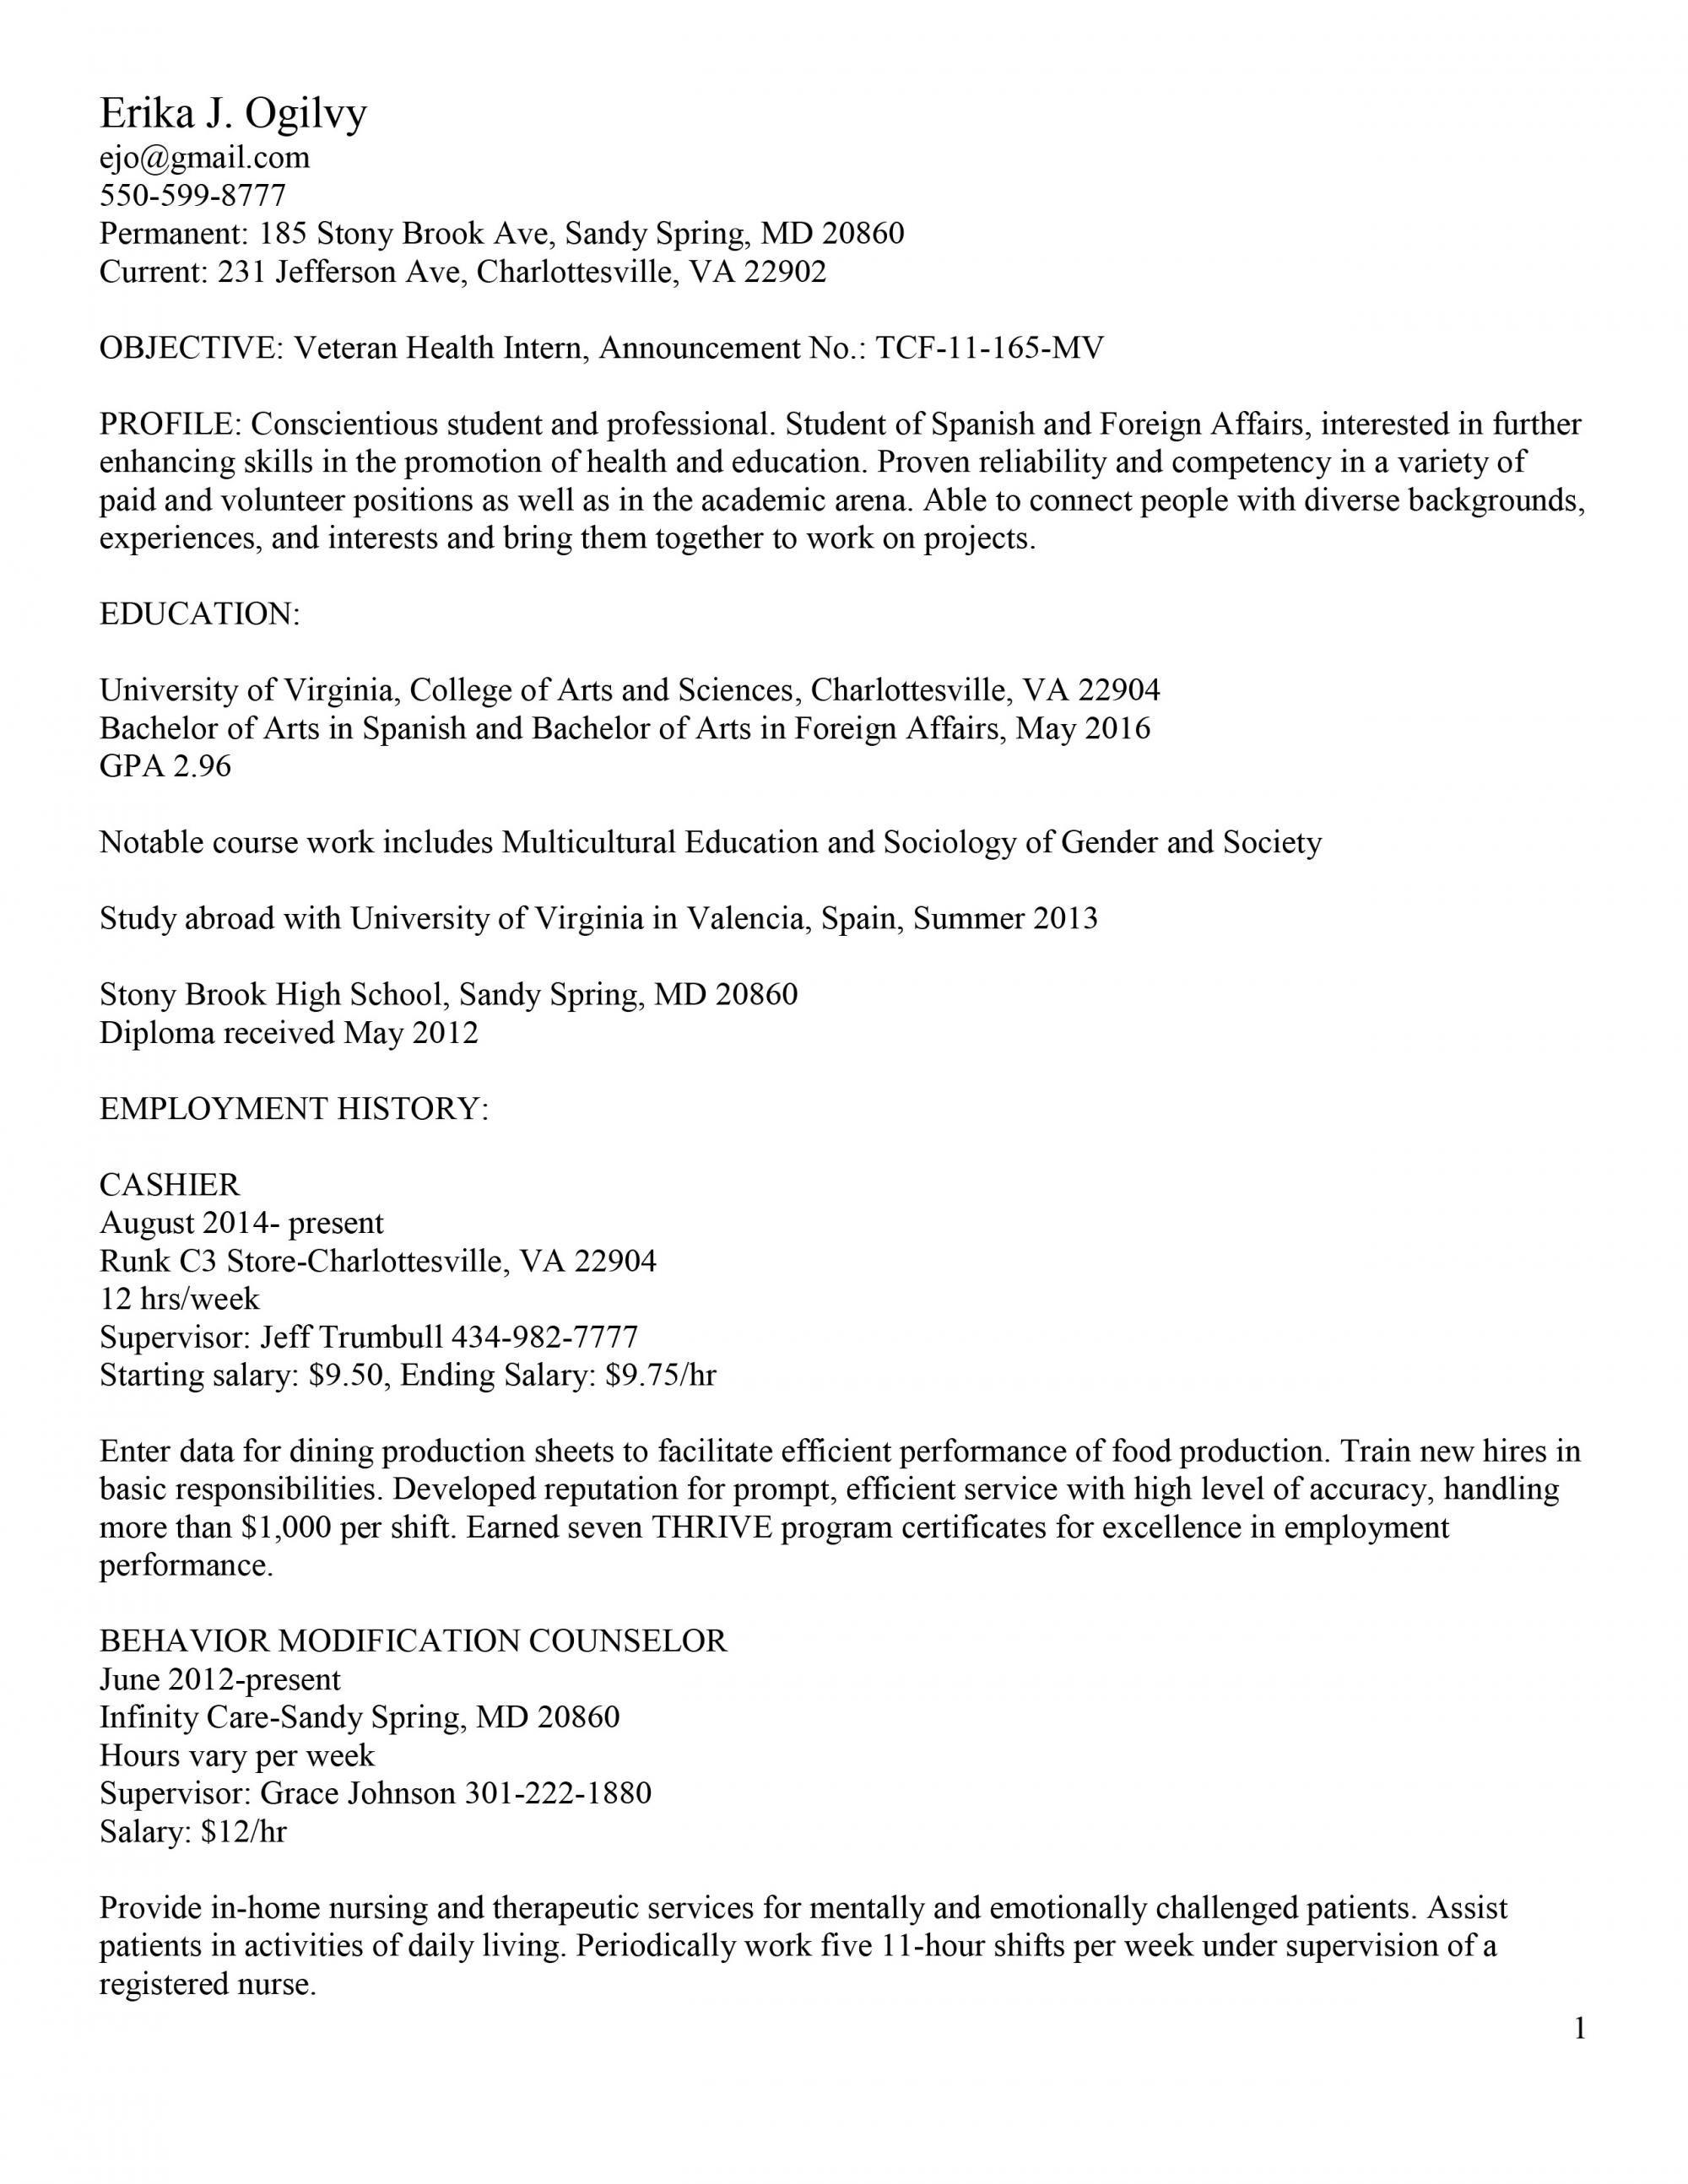 Elegant Resume Templates Virginia Tech #resume #ResumeTemplates #templates #virginia